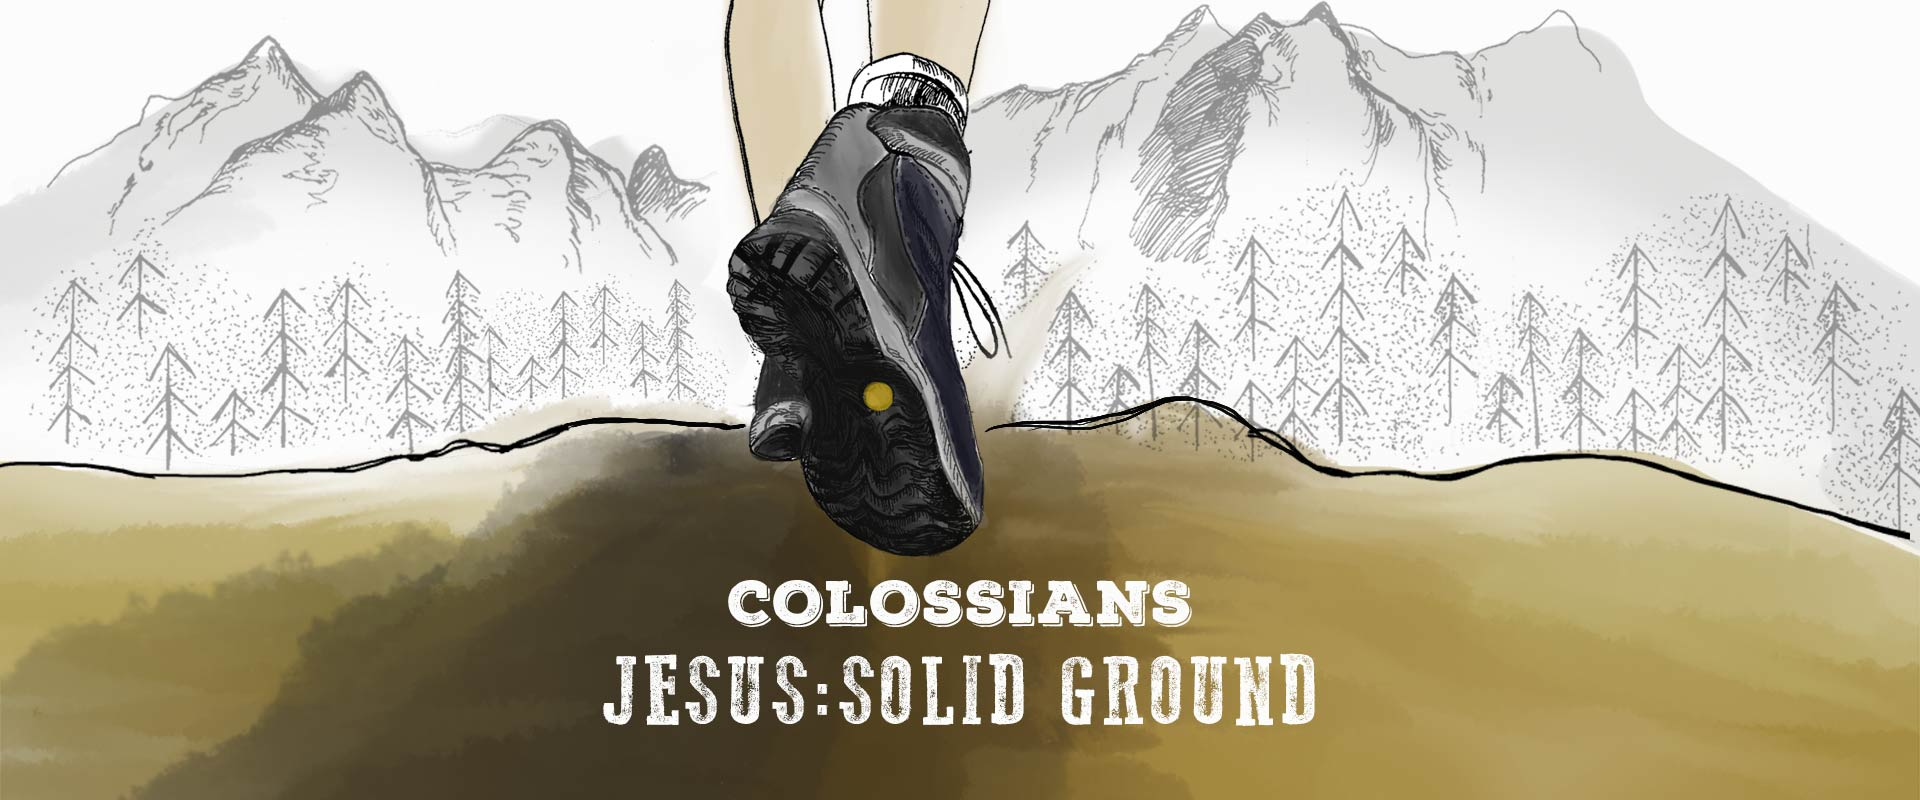 Colossians-Carousel